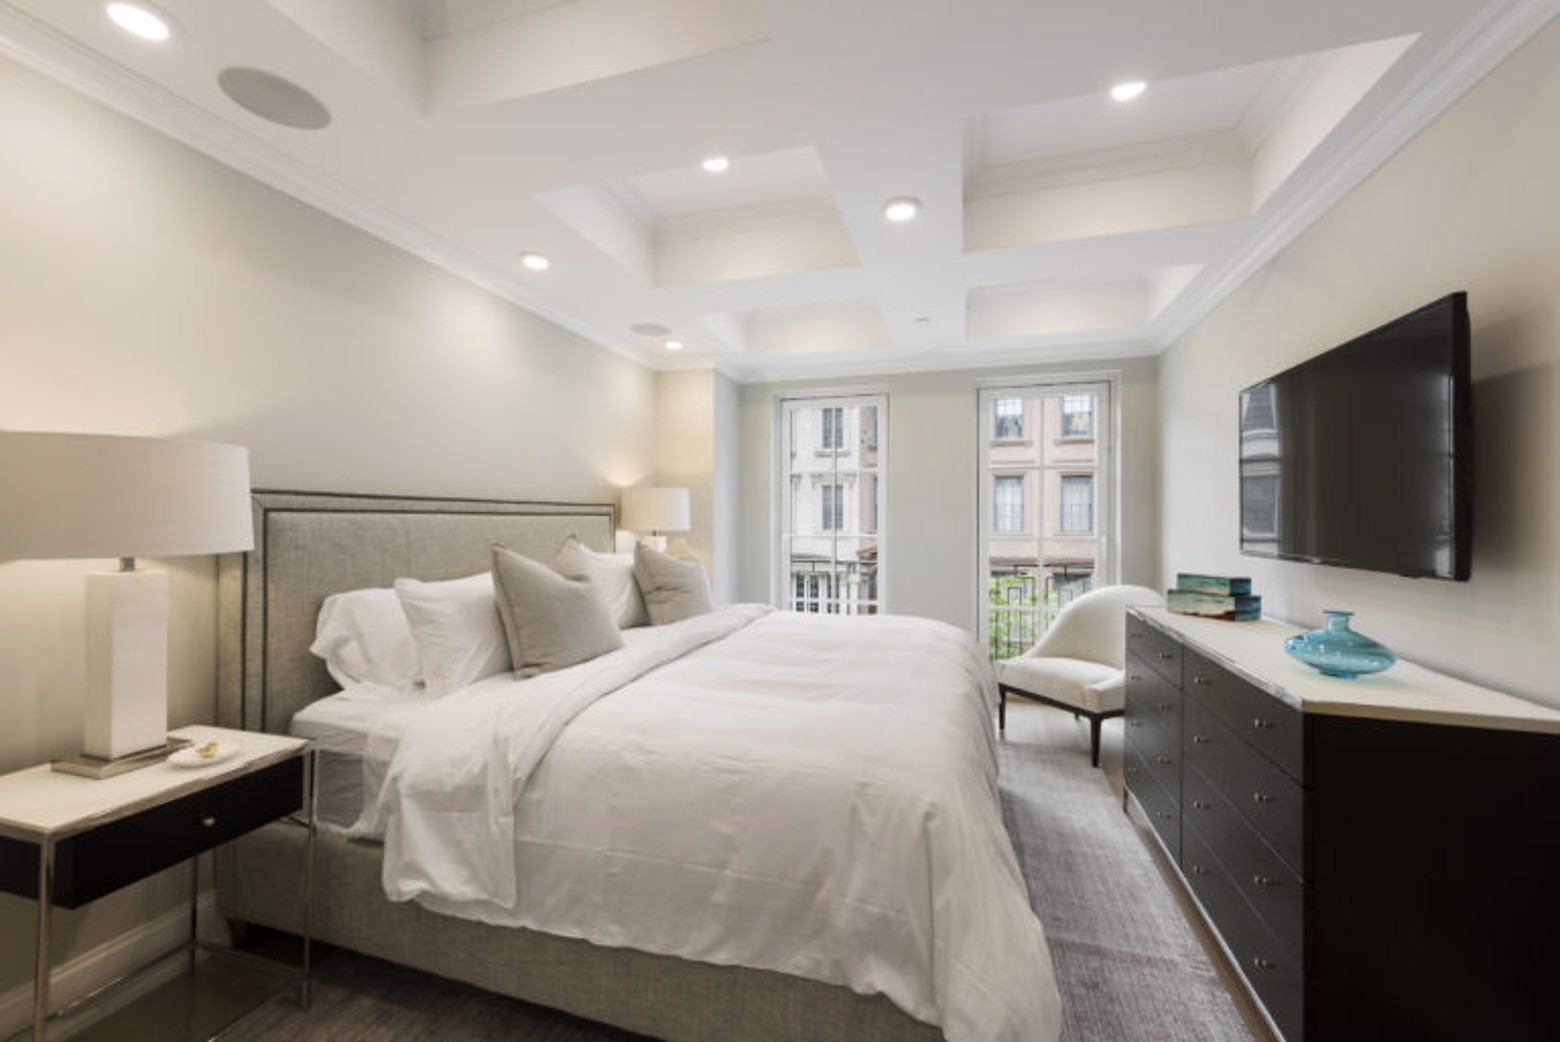 Upper Eastside Luxury Boutique Condominium, New York image